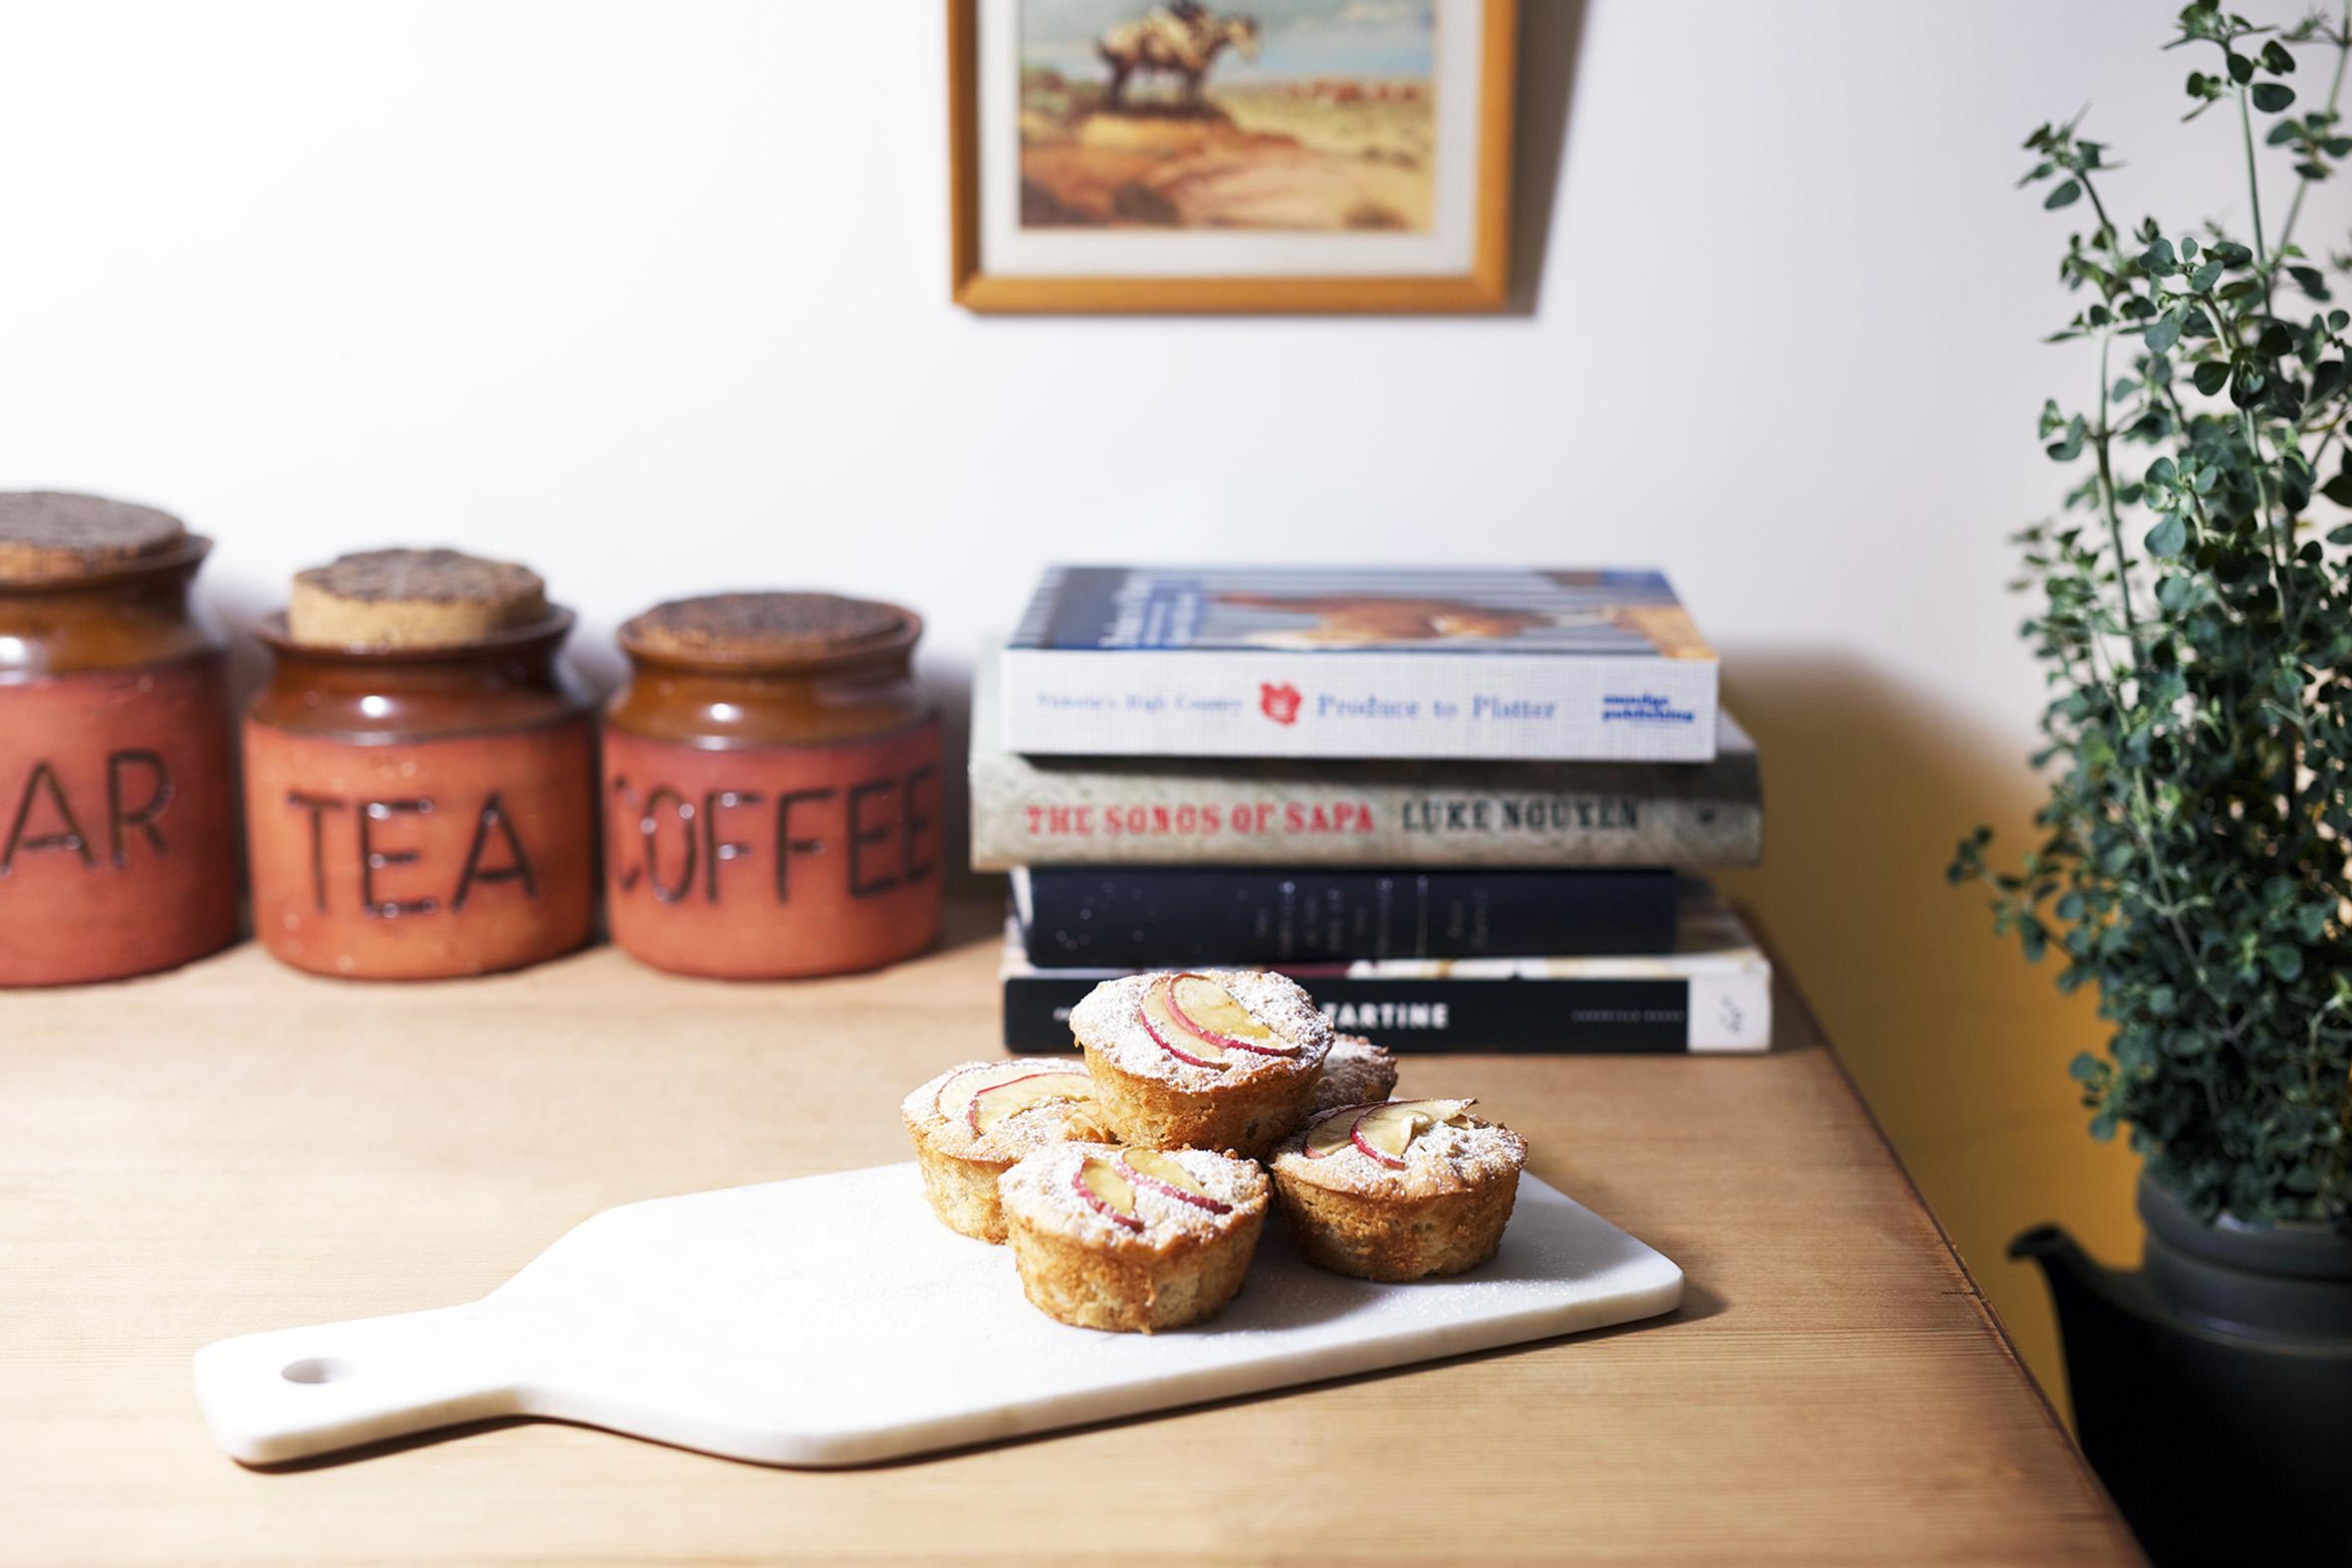 Oliver and york prana chai muffins.jpg